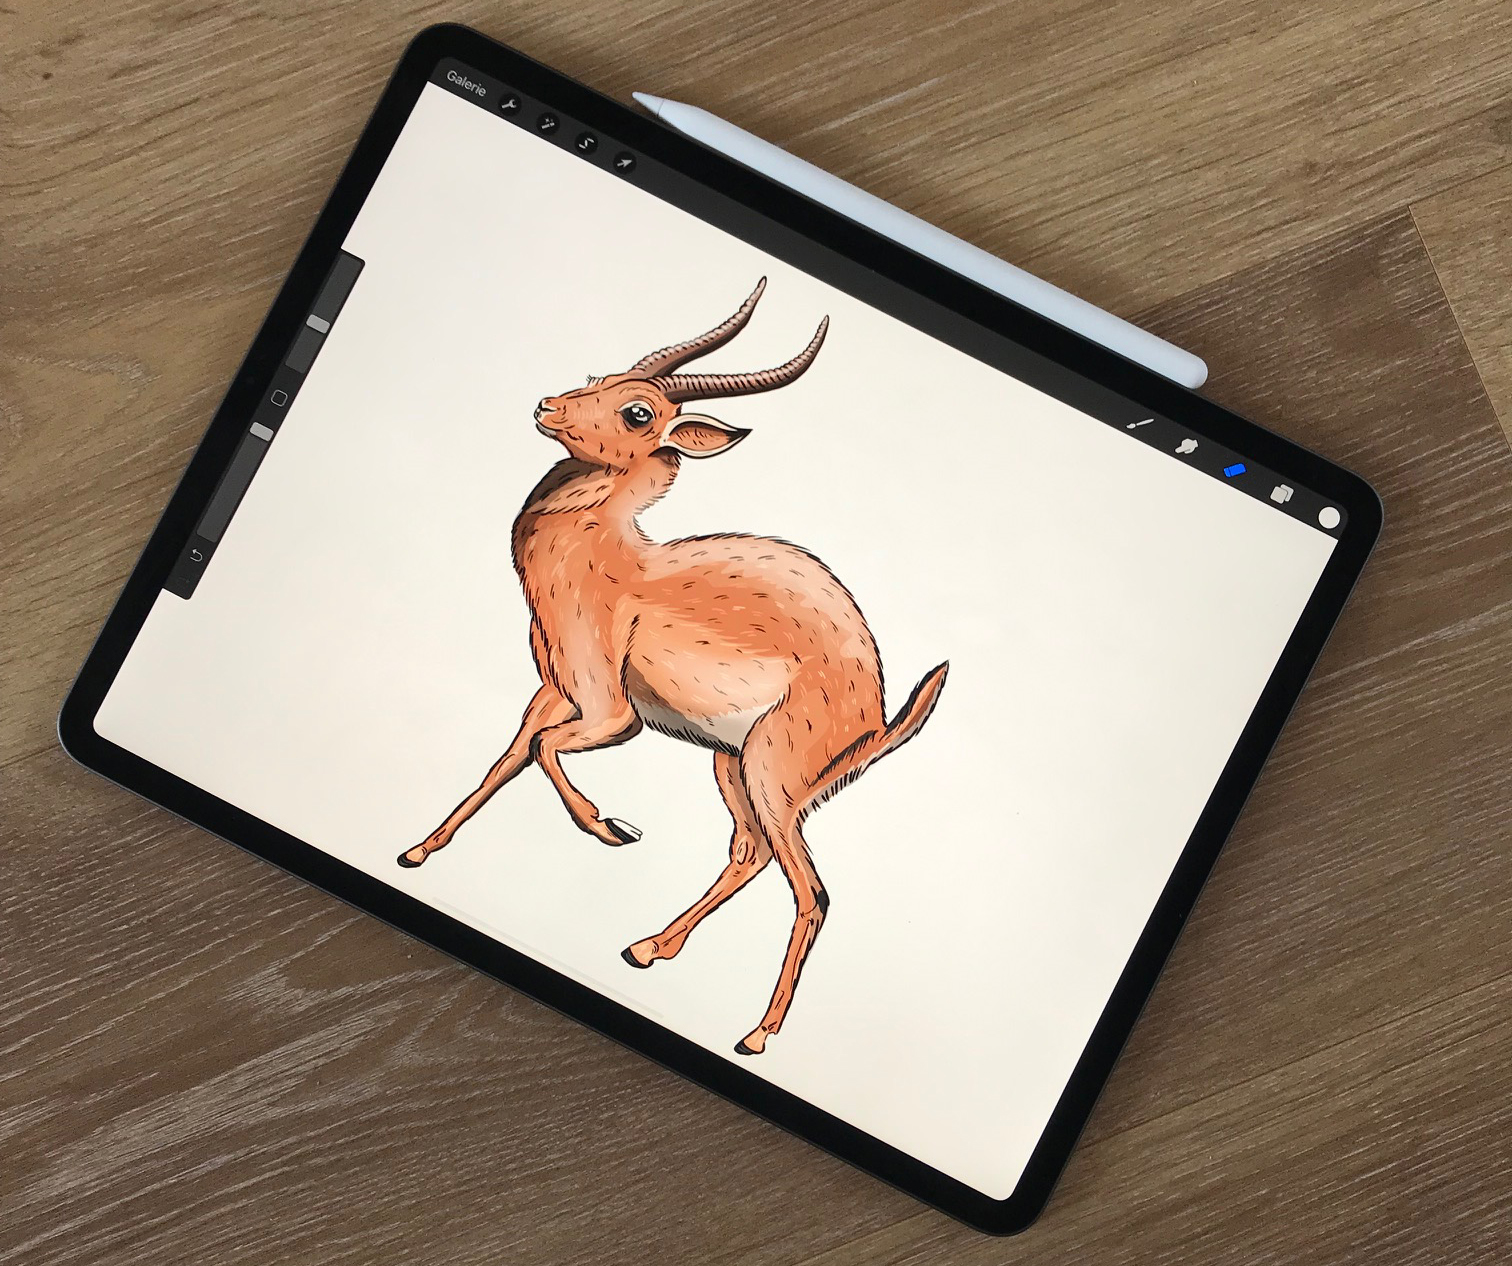 iPad creative workflows